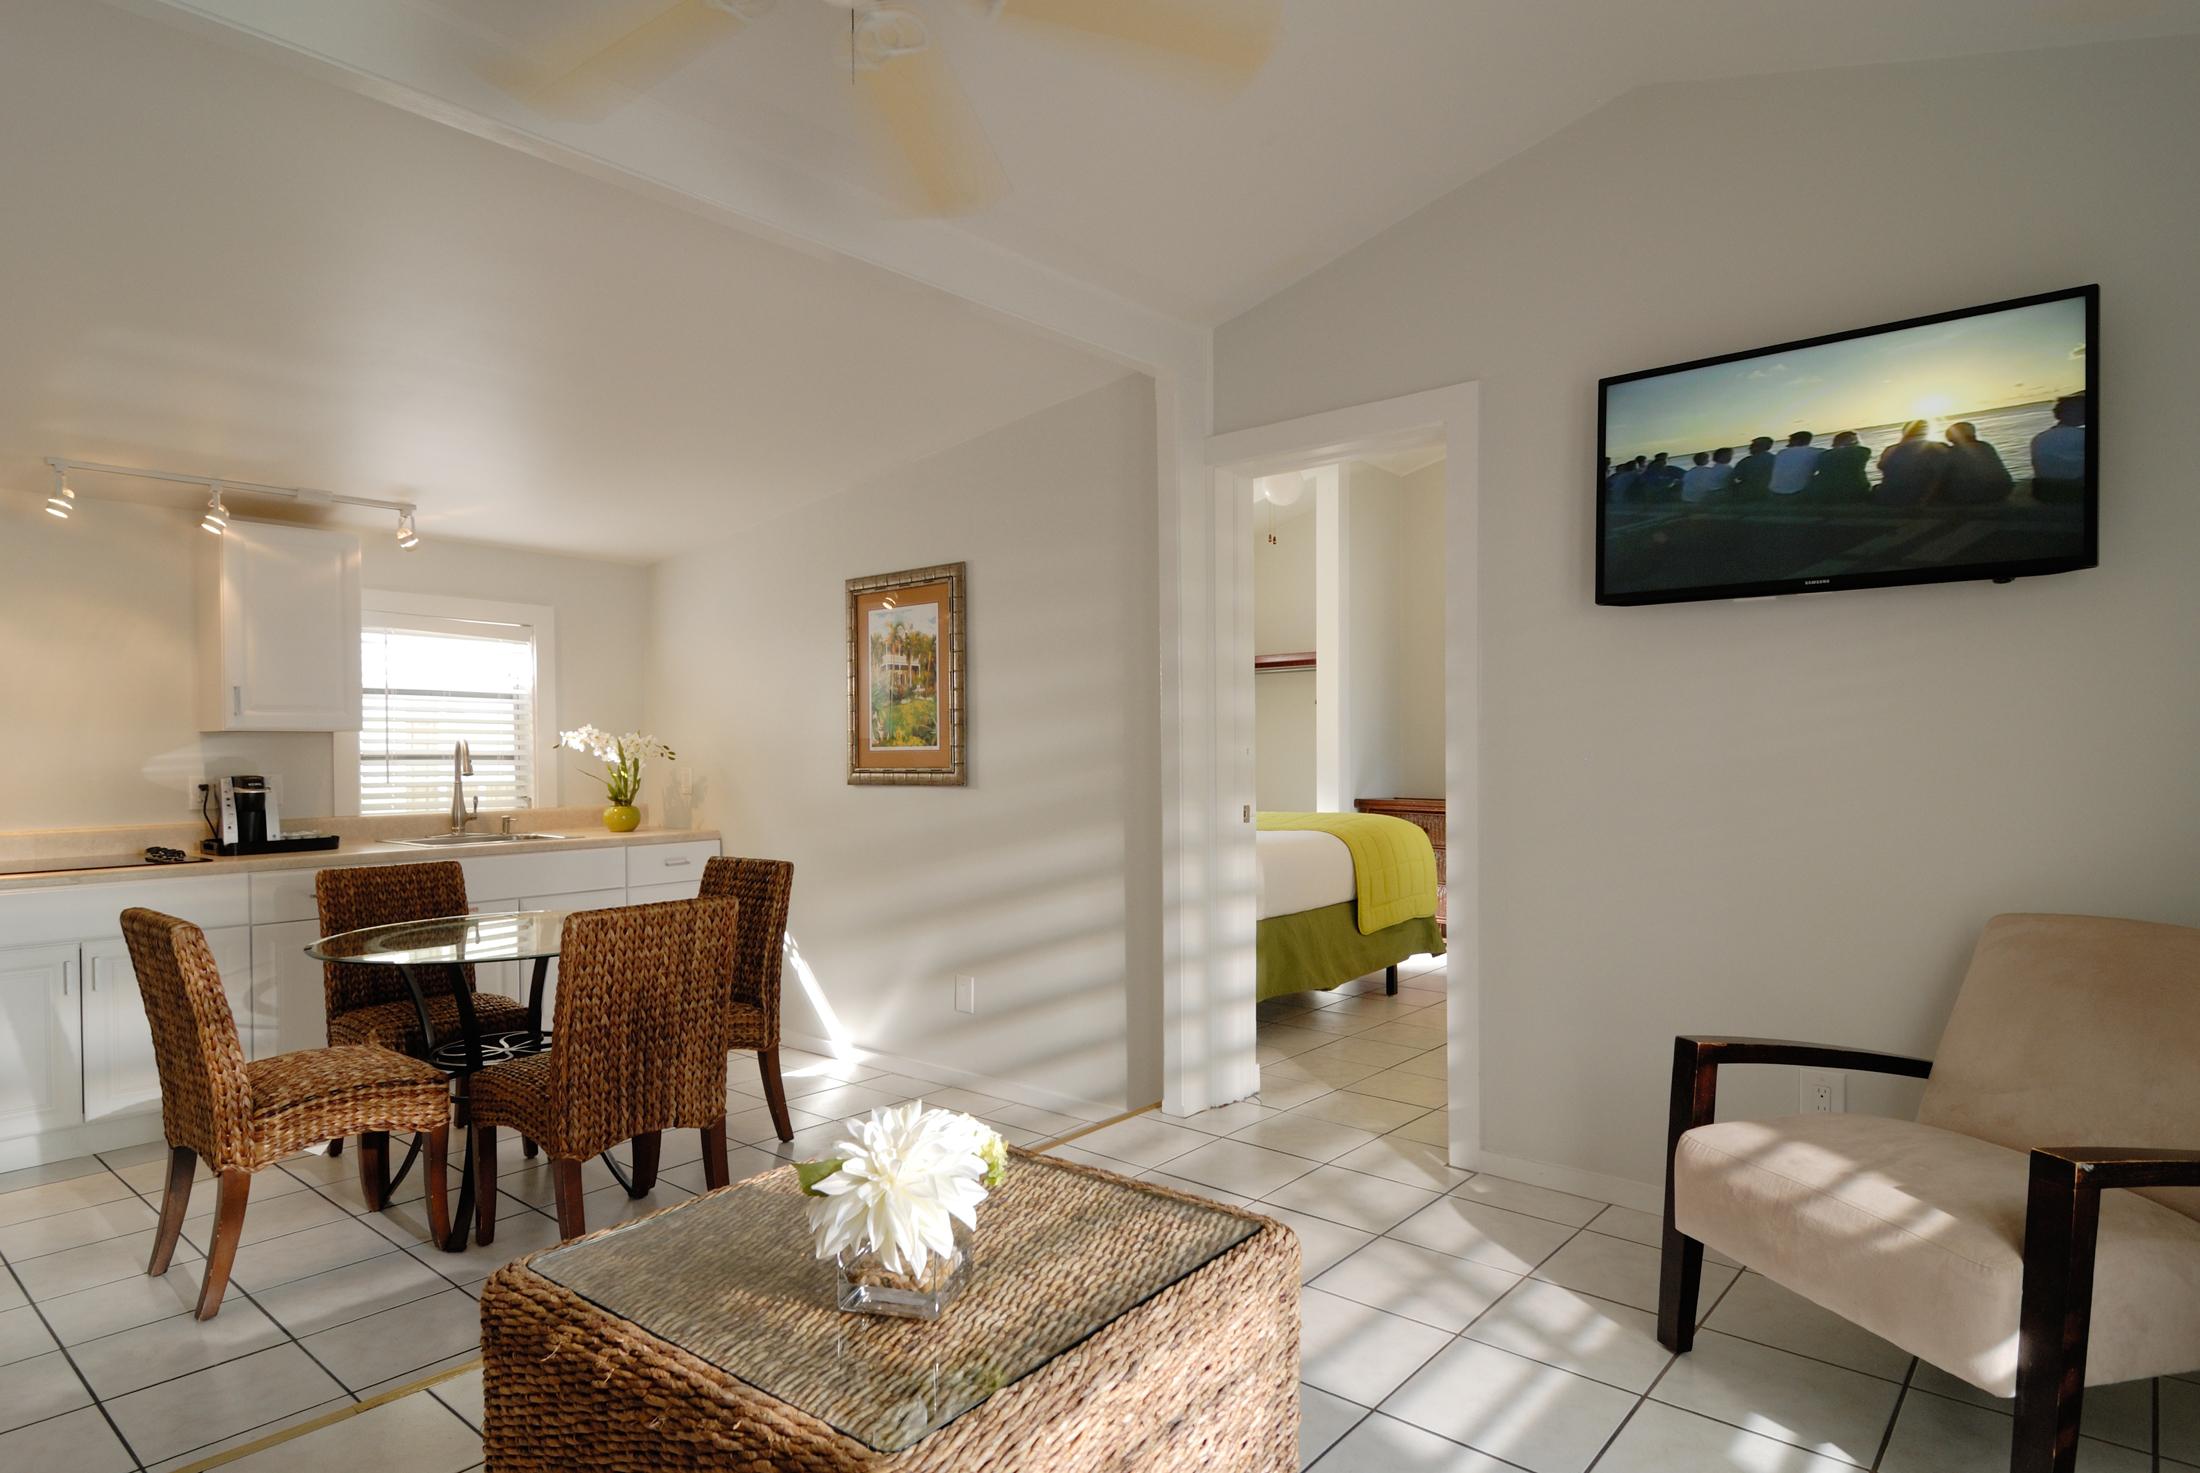 Merlin Guest House in Key West image 2